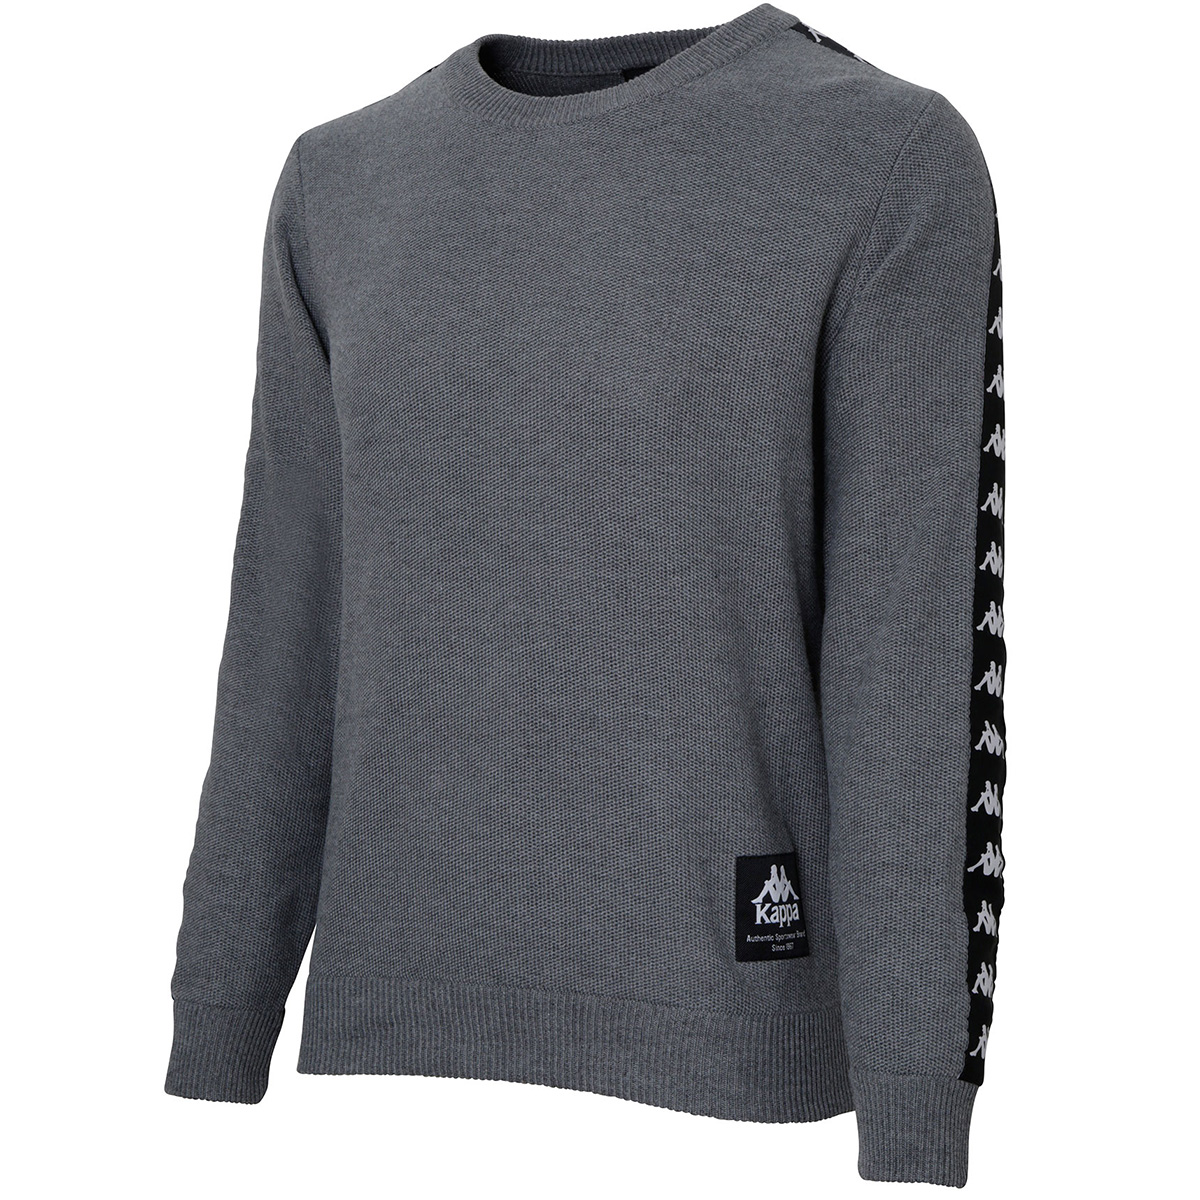 Kappa GOLF BANDA クルーネックセーター